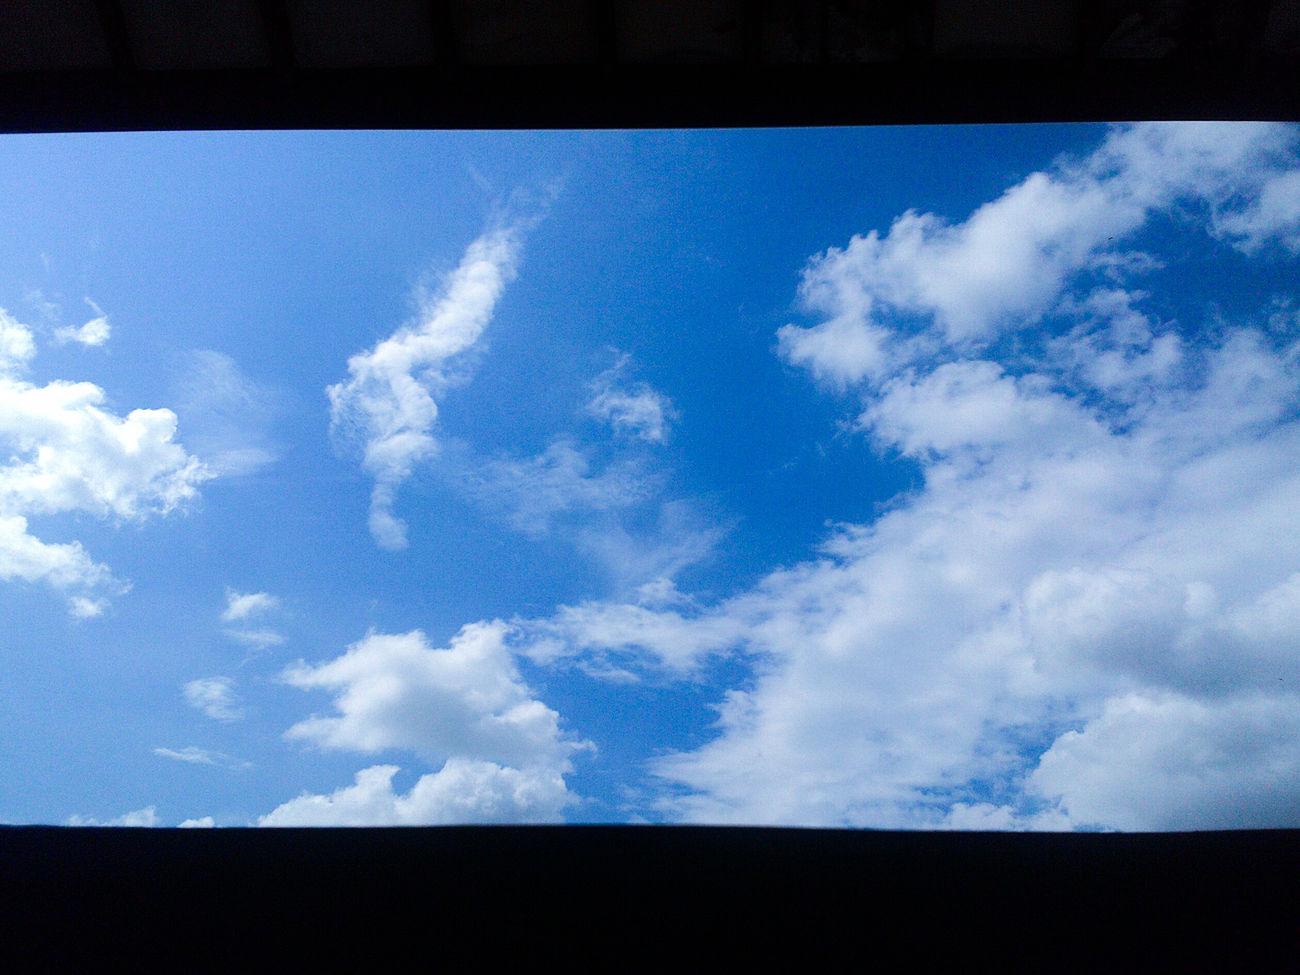 INDONESIA Photos Sky Air Cloud Outdoors Hunting Light Lanscape Best Photo  Photography Photos Blue High Film Strip Foto Langit Cerah Lightern Berawan Mendung Ponsel For Sale Efek Film